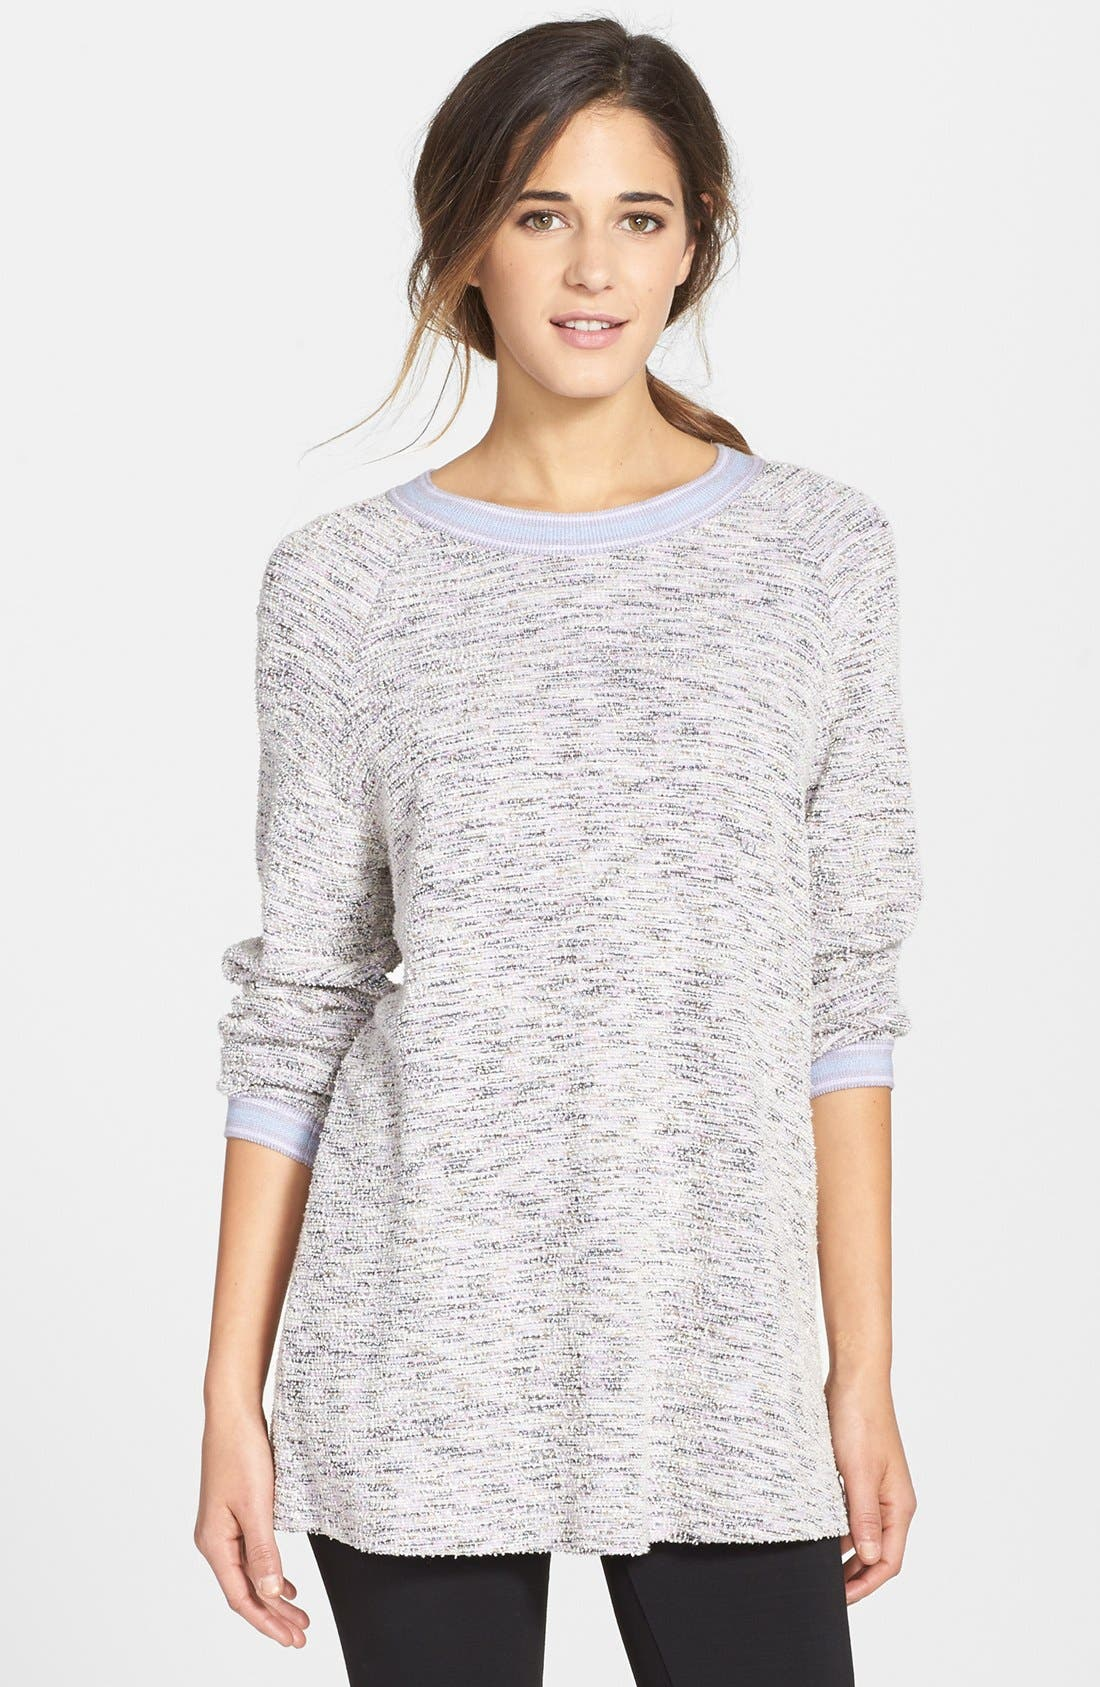 Alternate Image 1 Selected - Only Hearts Oversize Bouclé Knit Sweatshirt